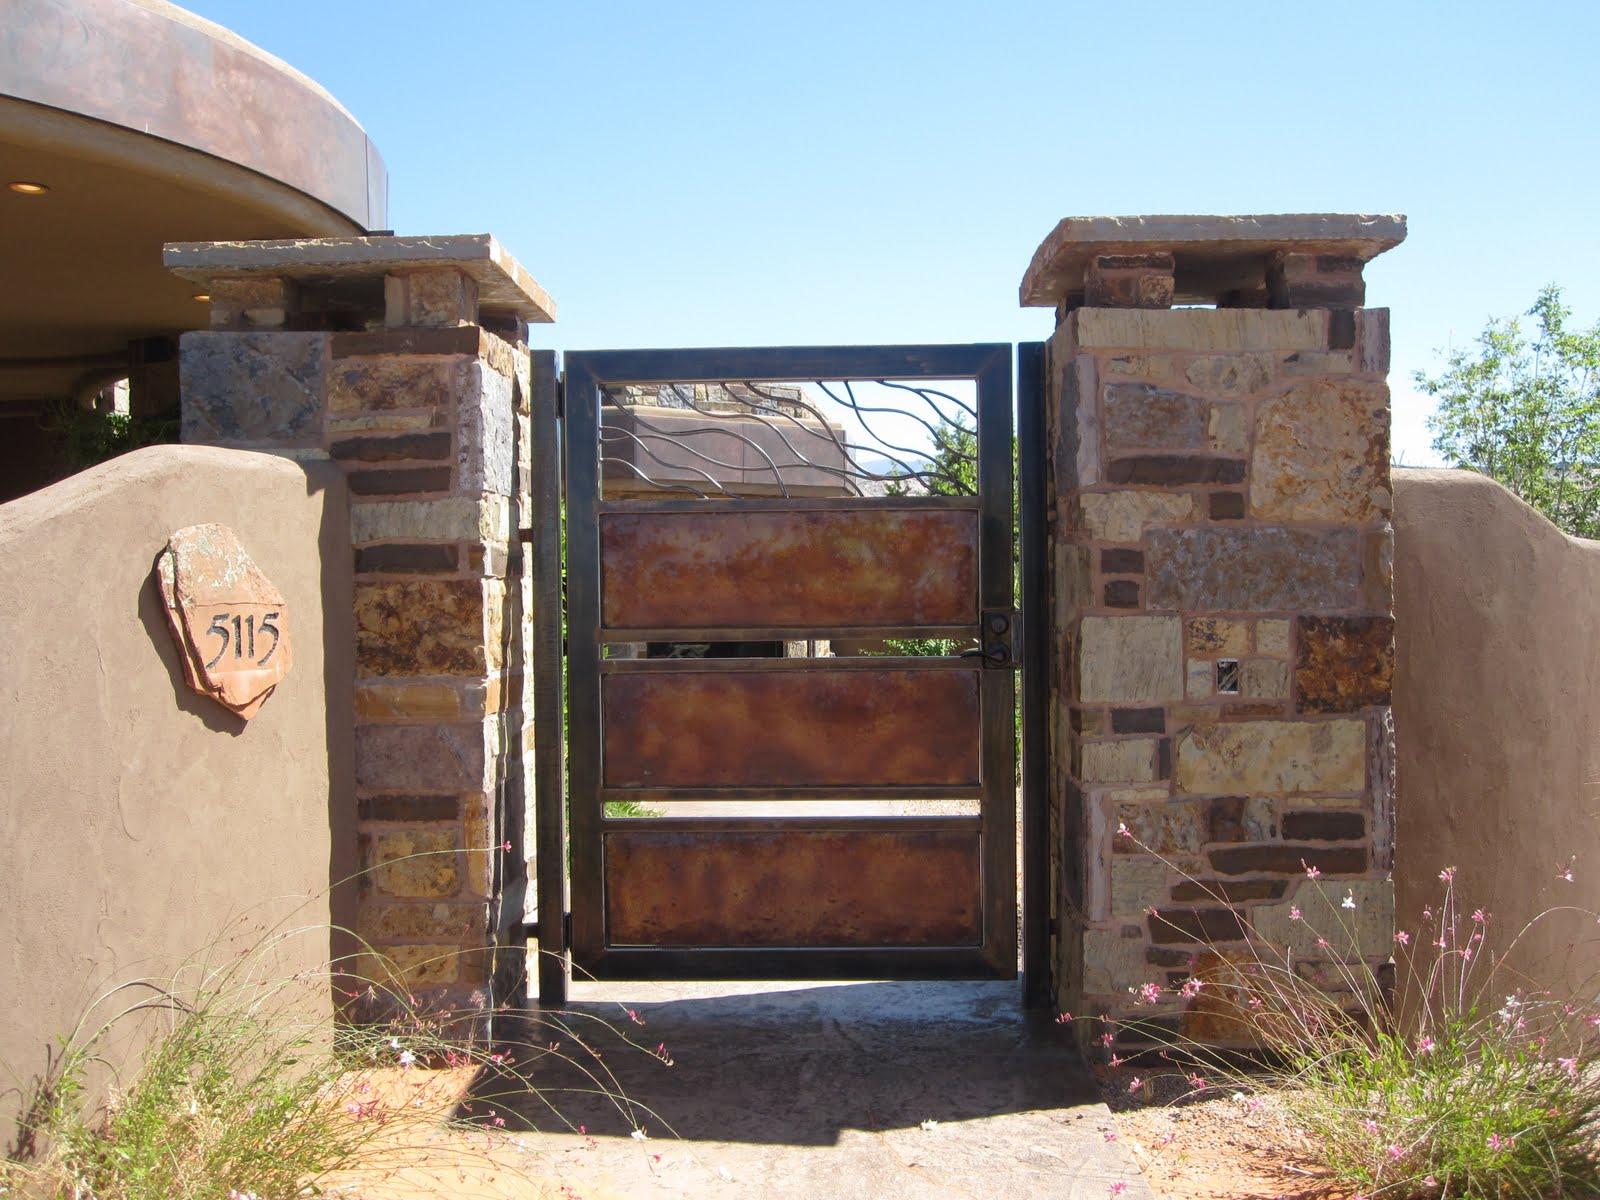 1200 #1272B9 BIG TIME House Lover : Garage Doors And Gates  St. George Utah wallpaper Utah Garage Doors 36851600